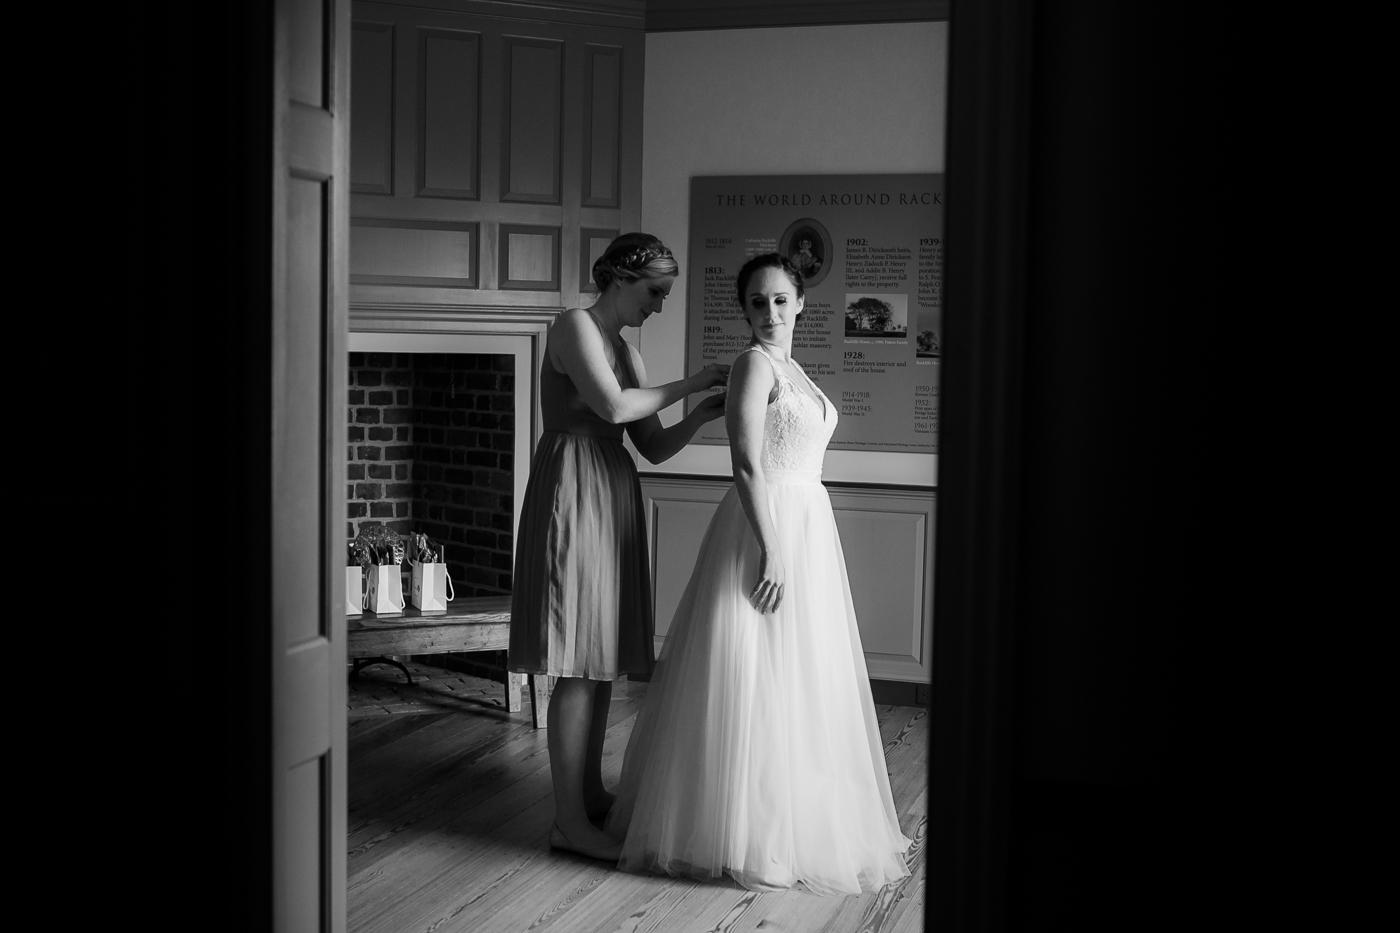 16_Rackliffe_House_Assateauge_Wedding_Cera_Mack_Photo_-2.jpg